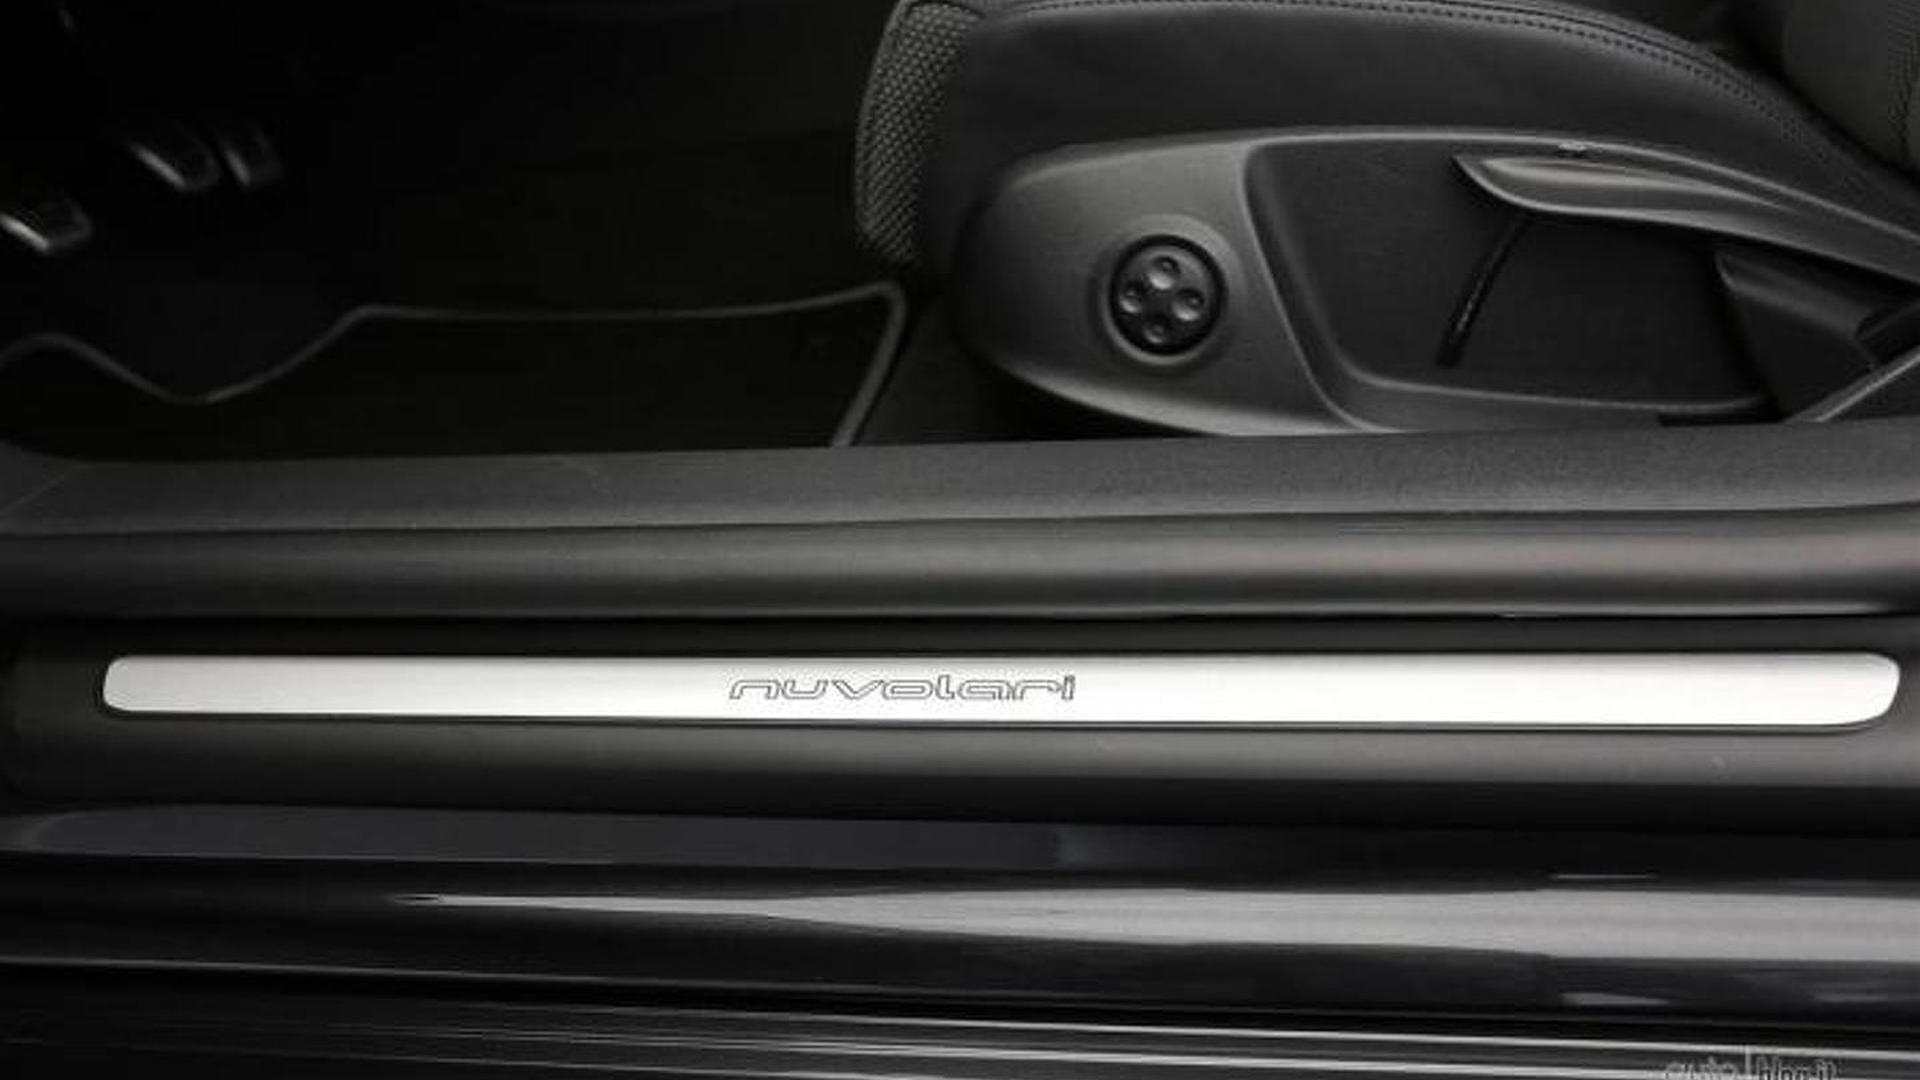 Регулировки сидений Audi TT Nuvolari